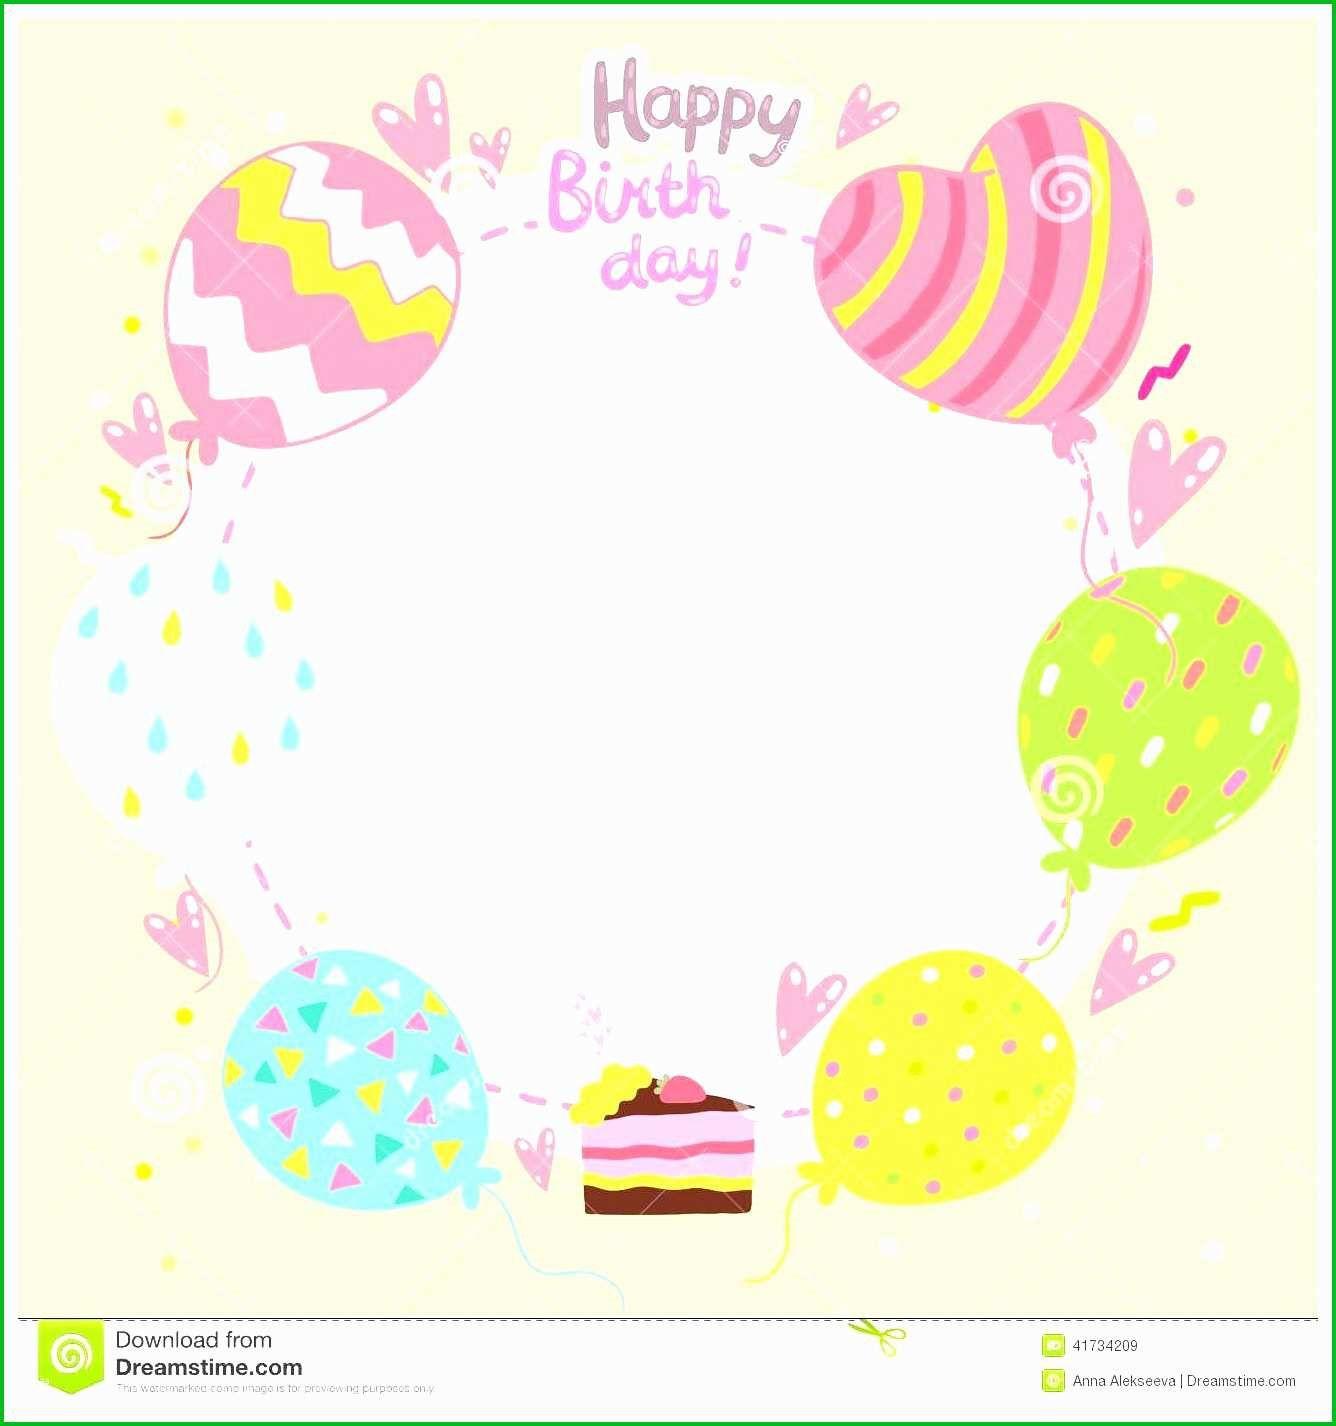 003 Unforgettable Birthday Card Template Free Photo  Invitation Photoshop Download WordFull